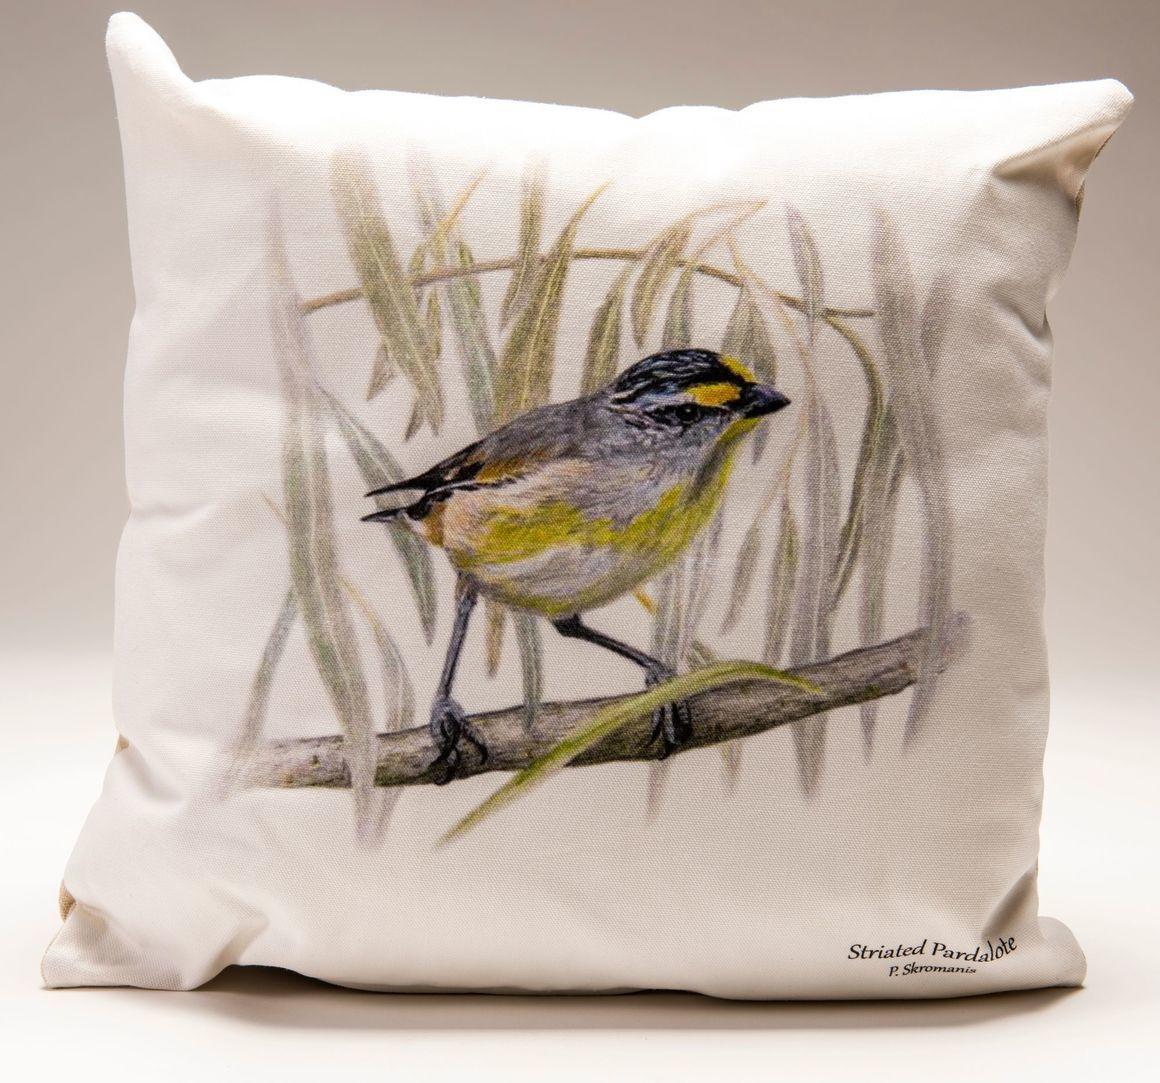 Cushion Covers - Striated Pardalote   Trada Marketplace